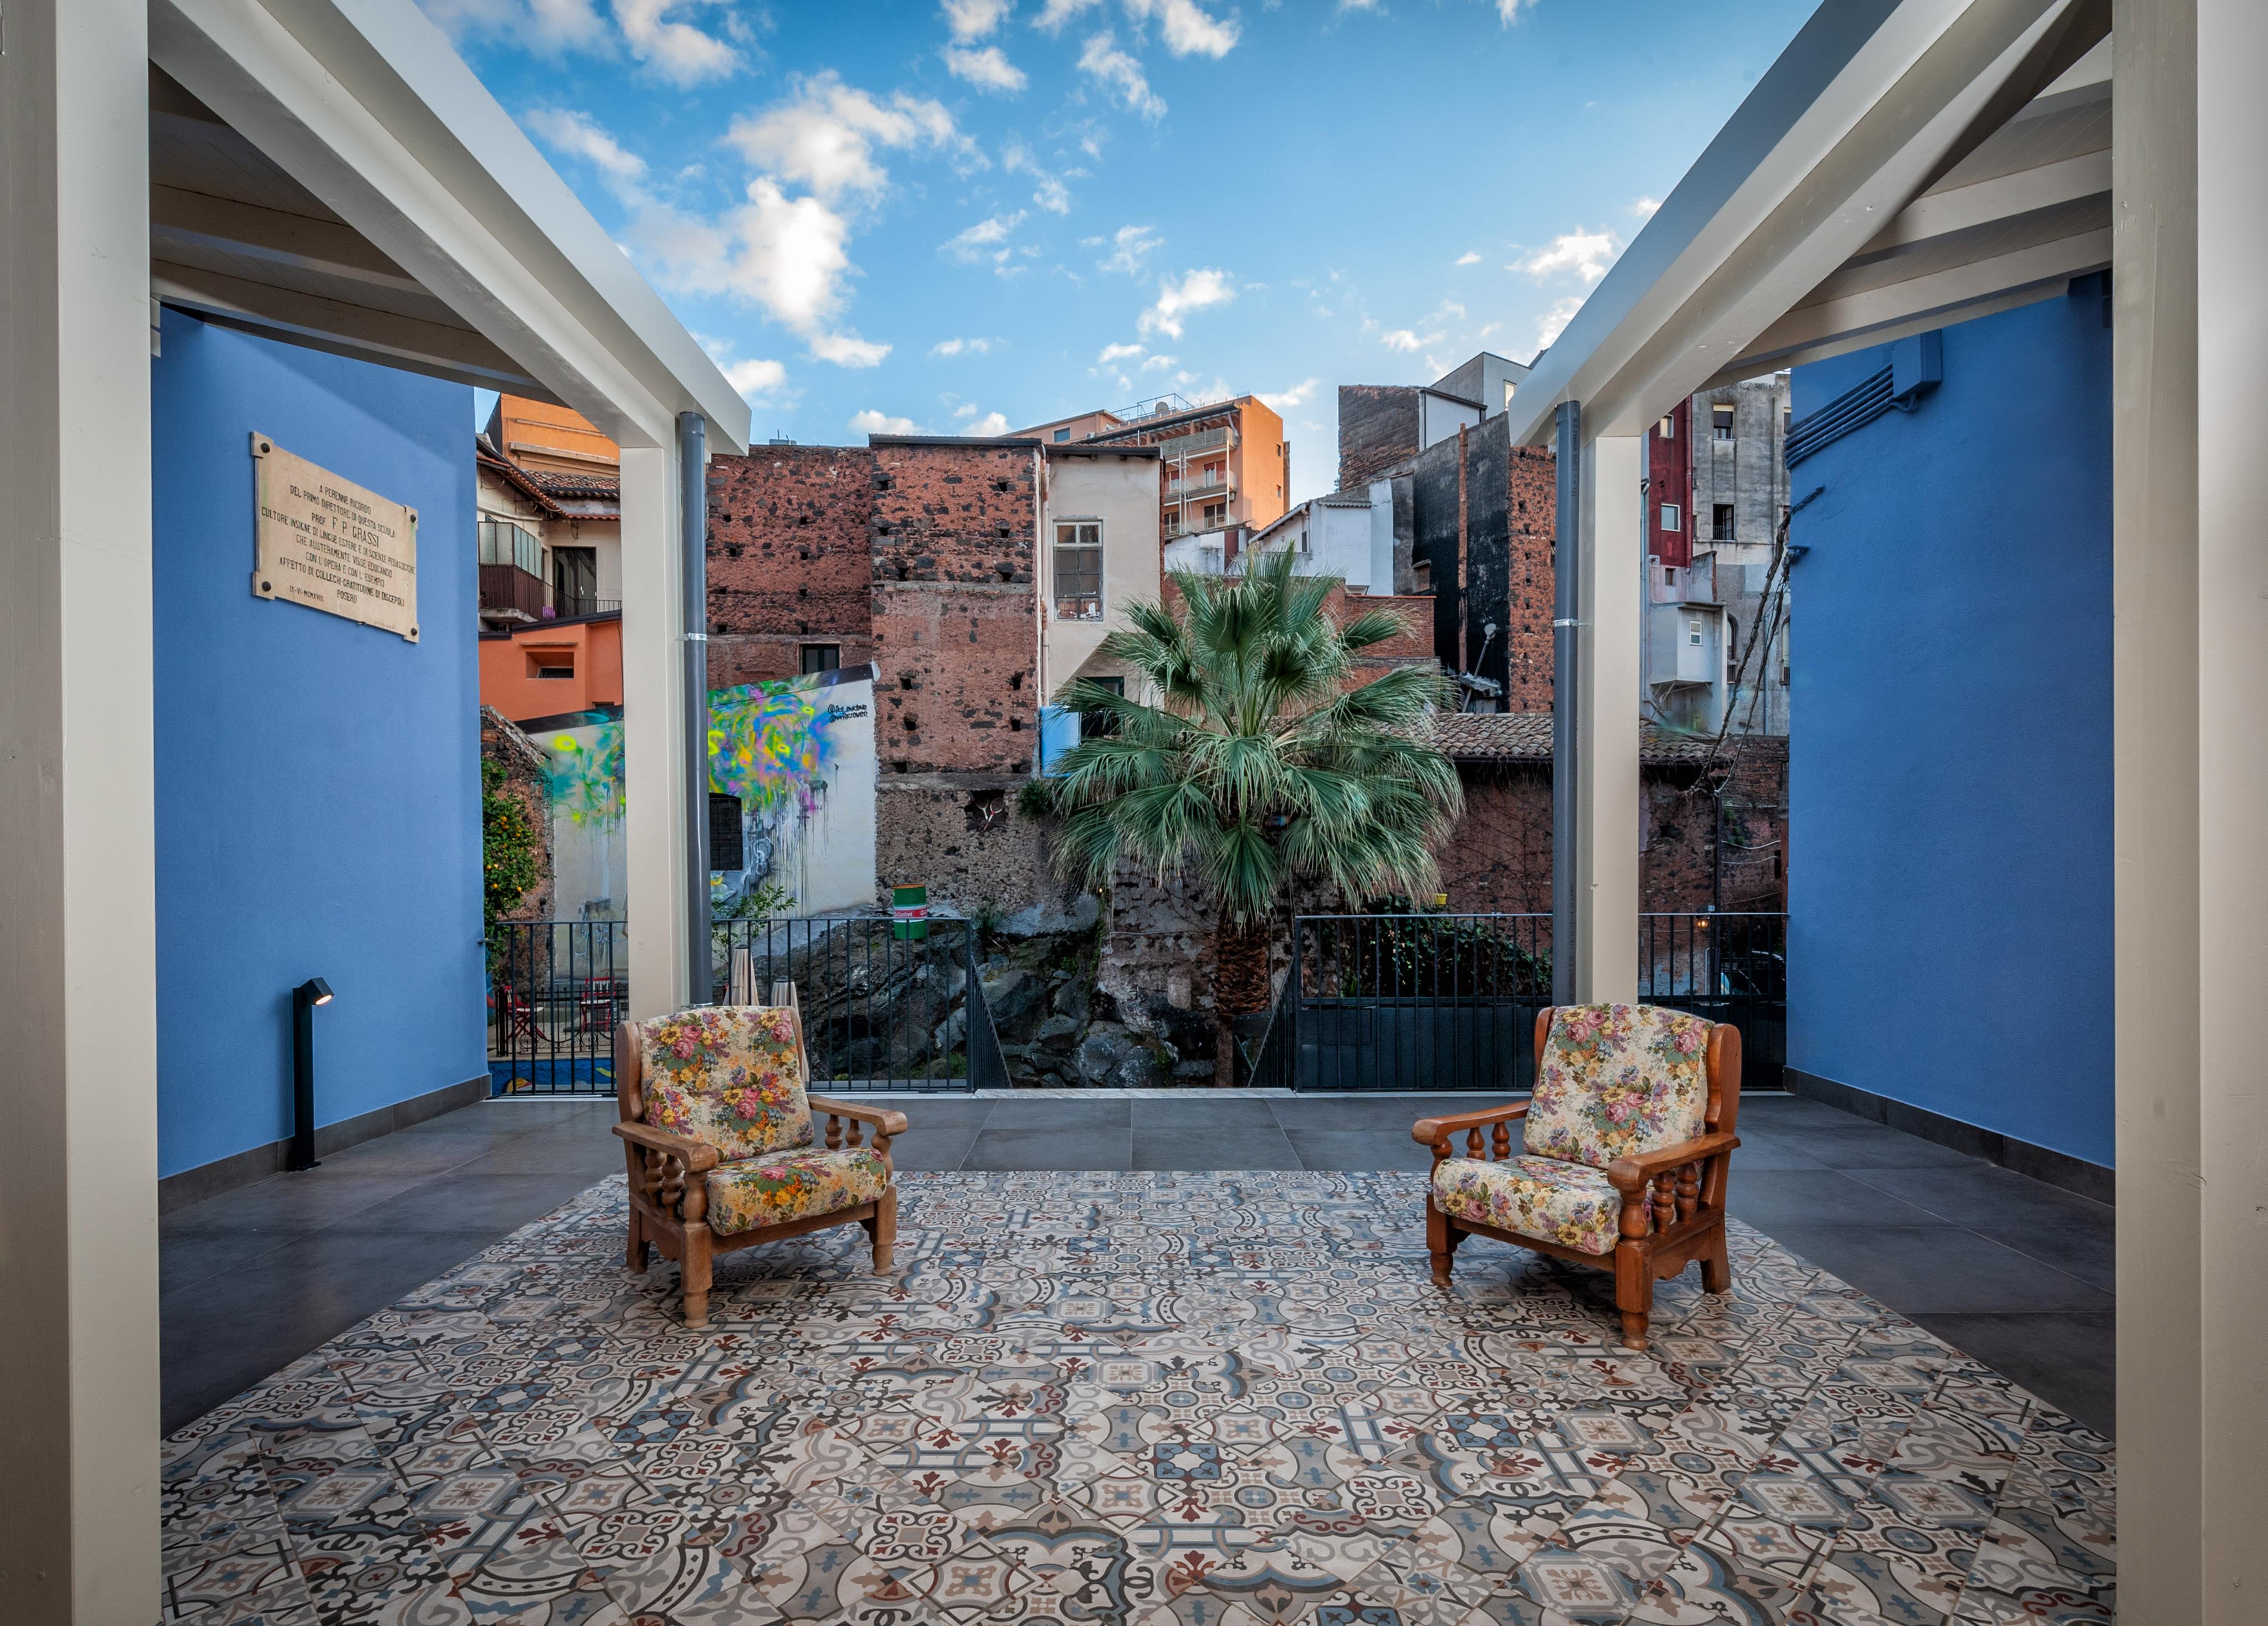 HOSTEL - The Yard Hostel